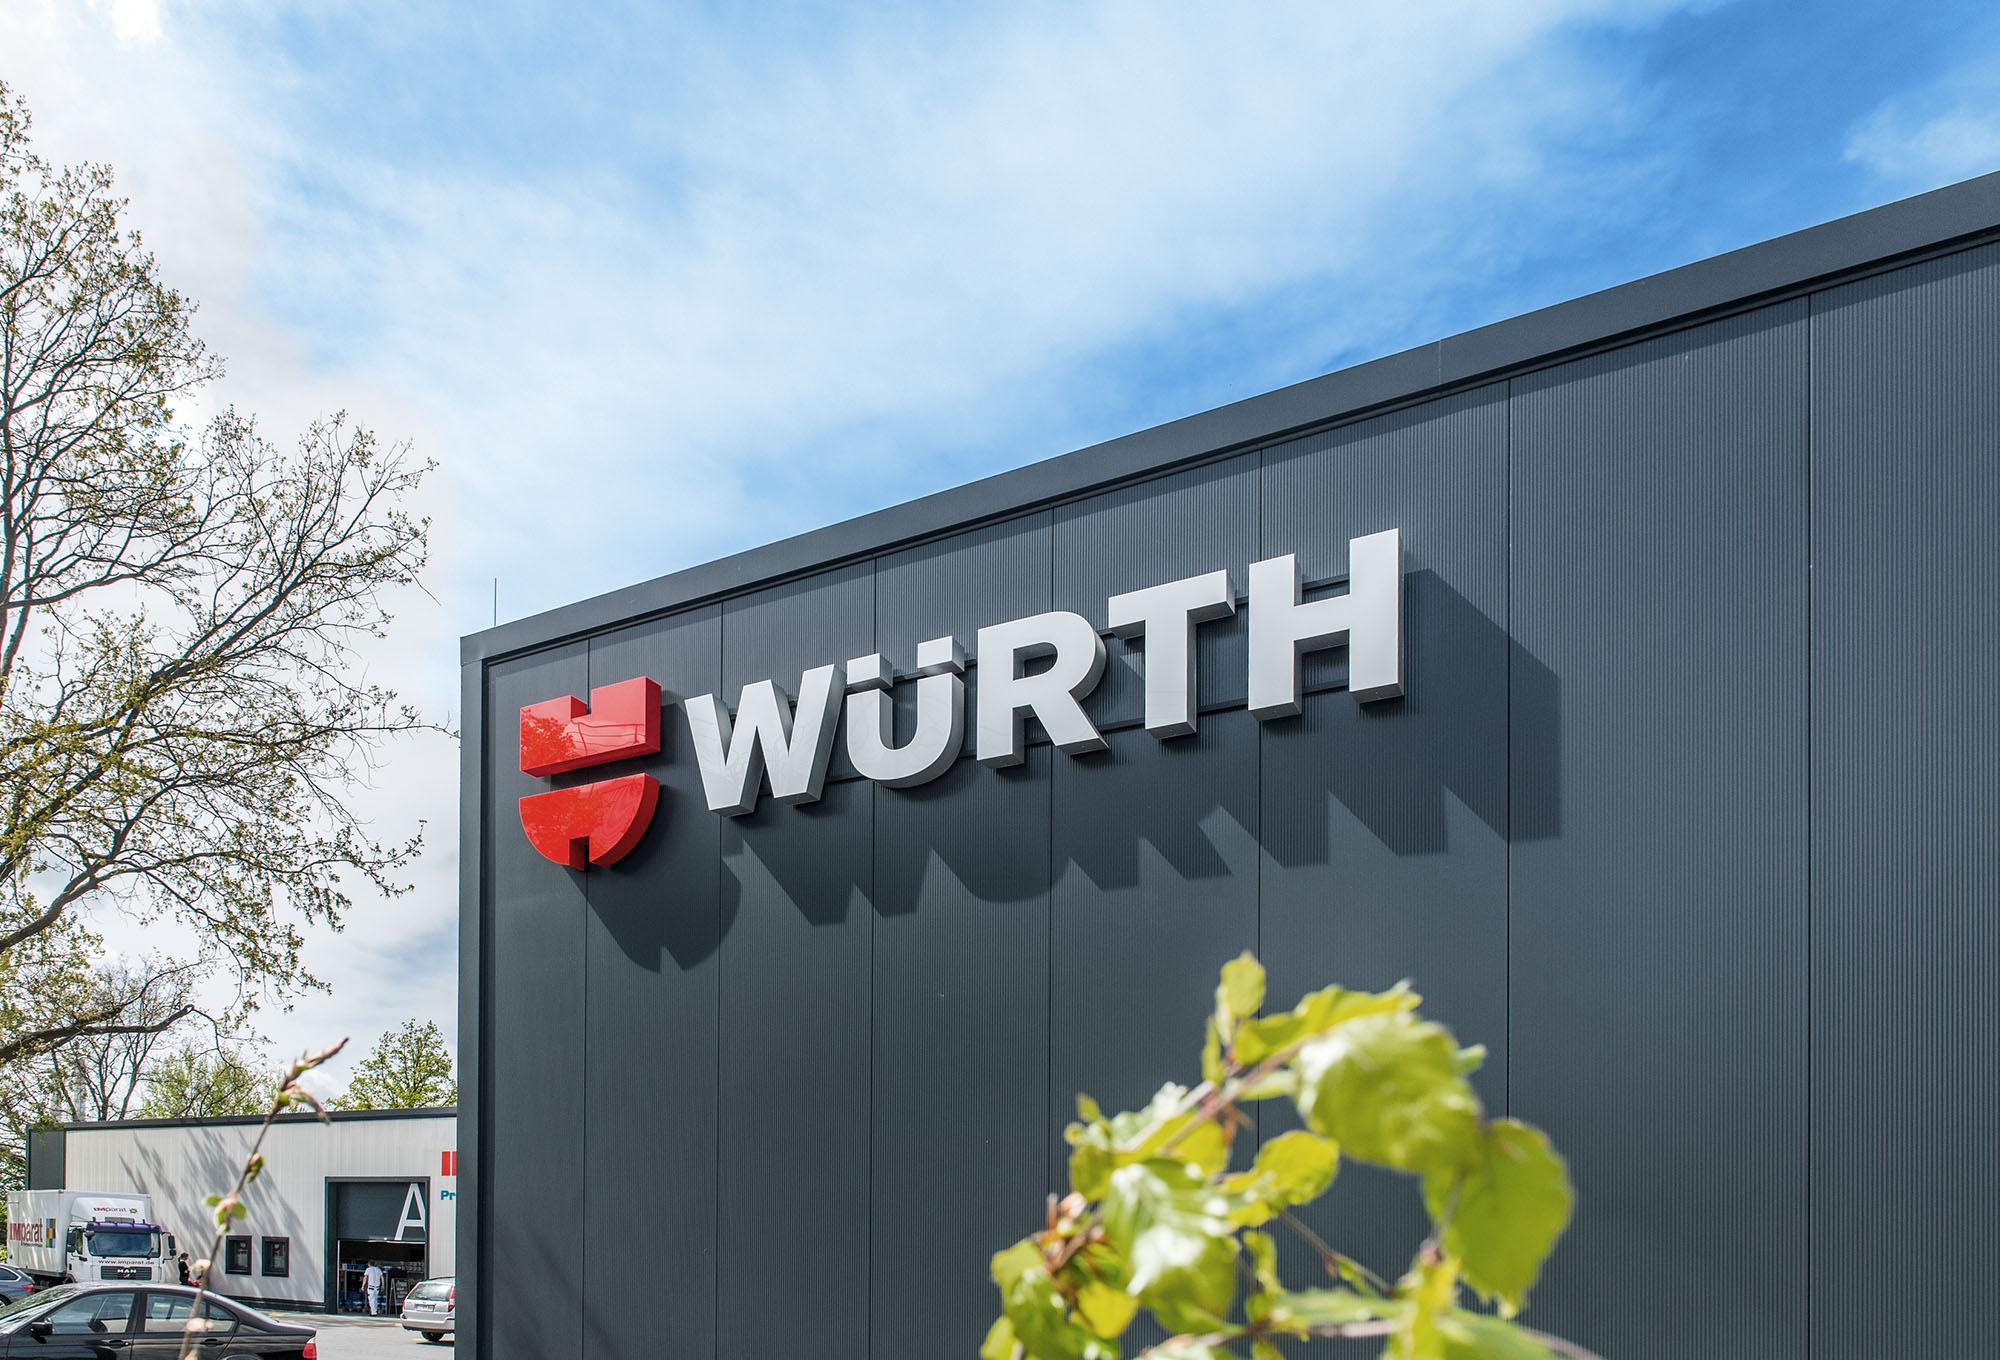 Wir begrüßen Adolf Würth